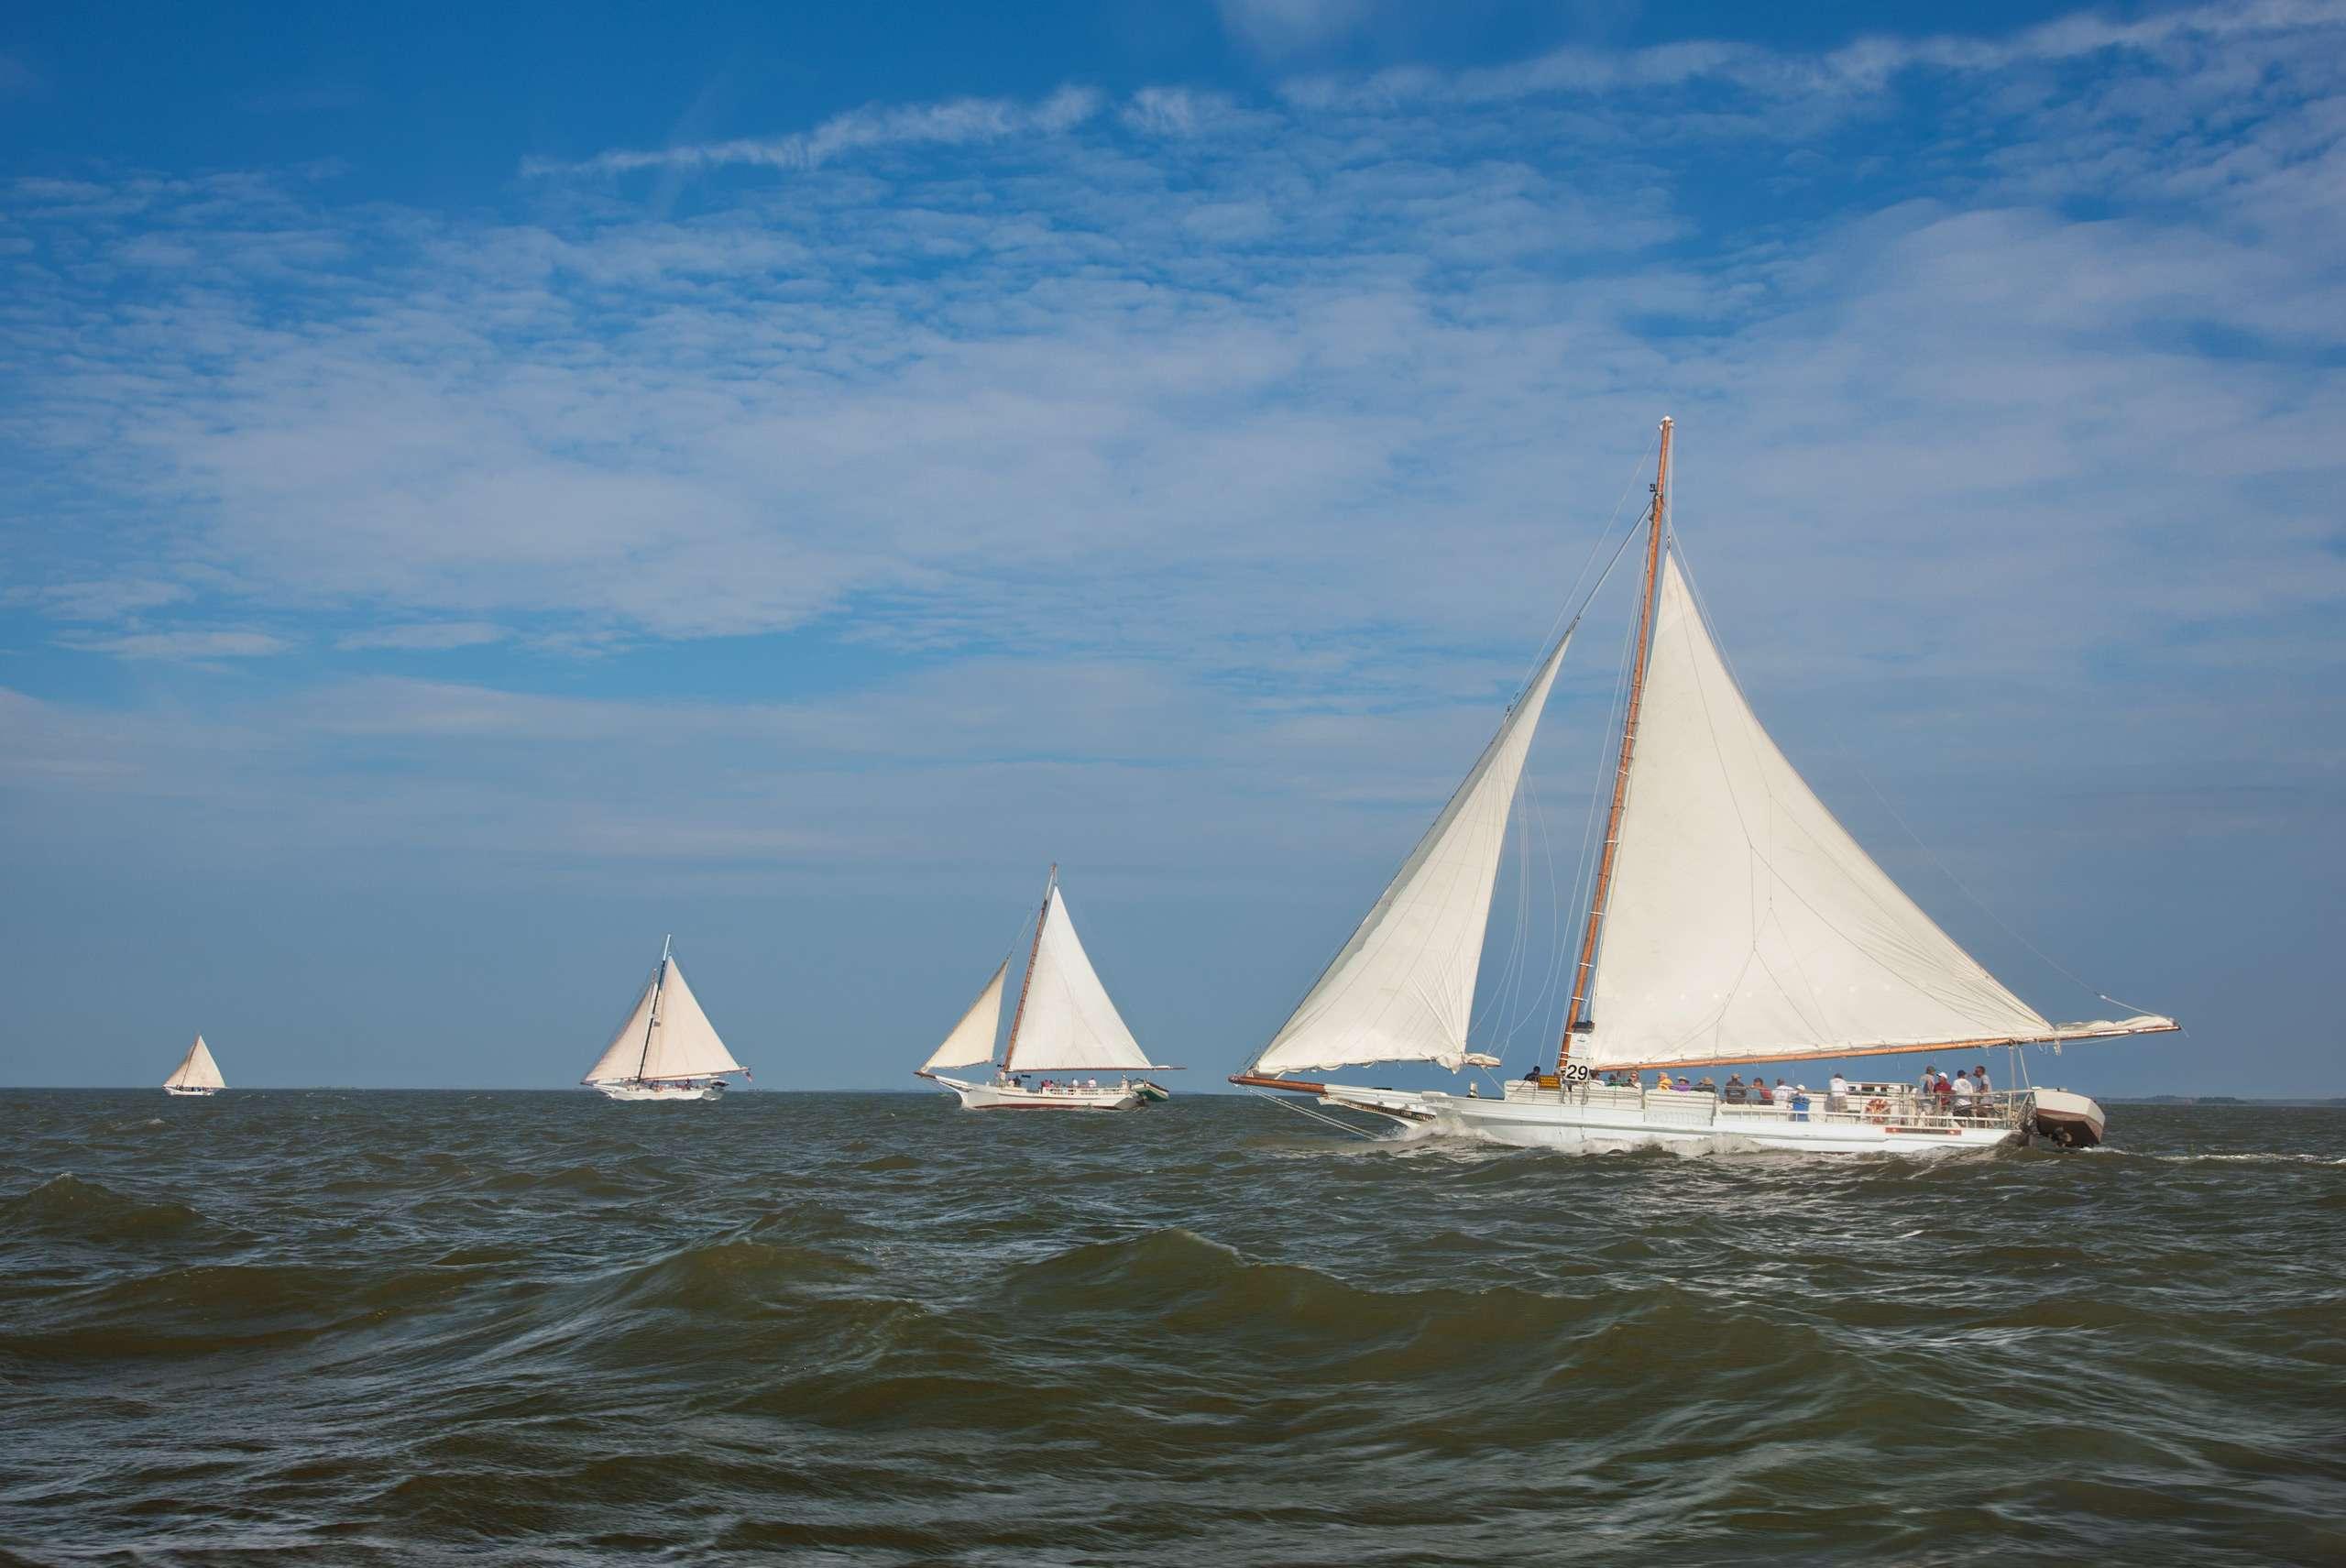 PORTFOLIO - Sailing - Chesapeake #17   PCG653